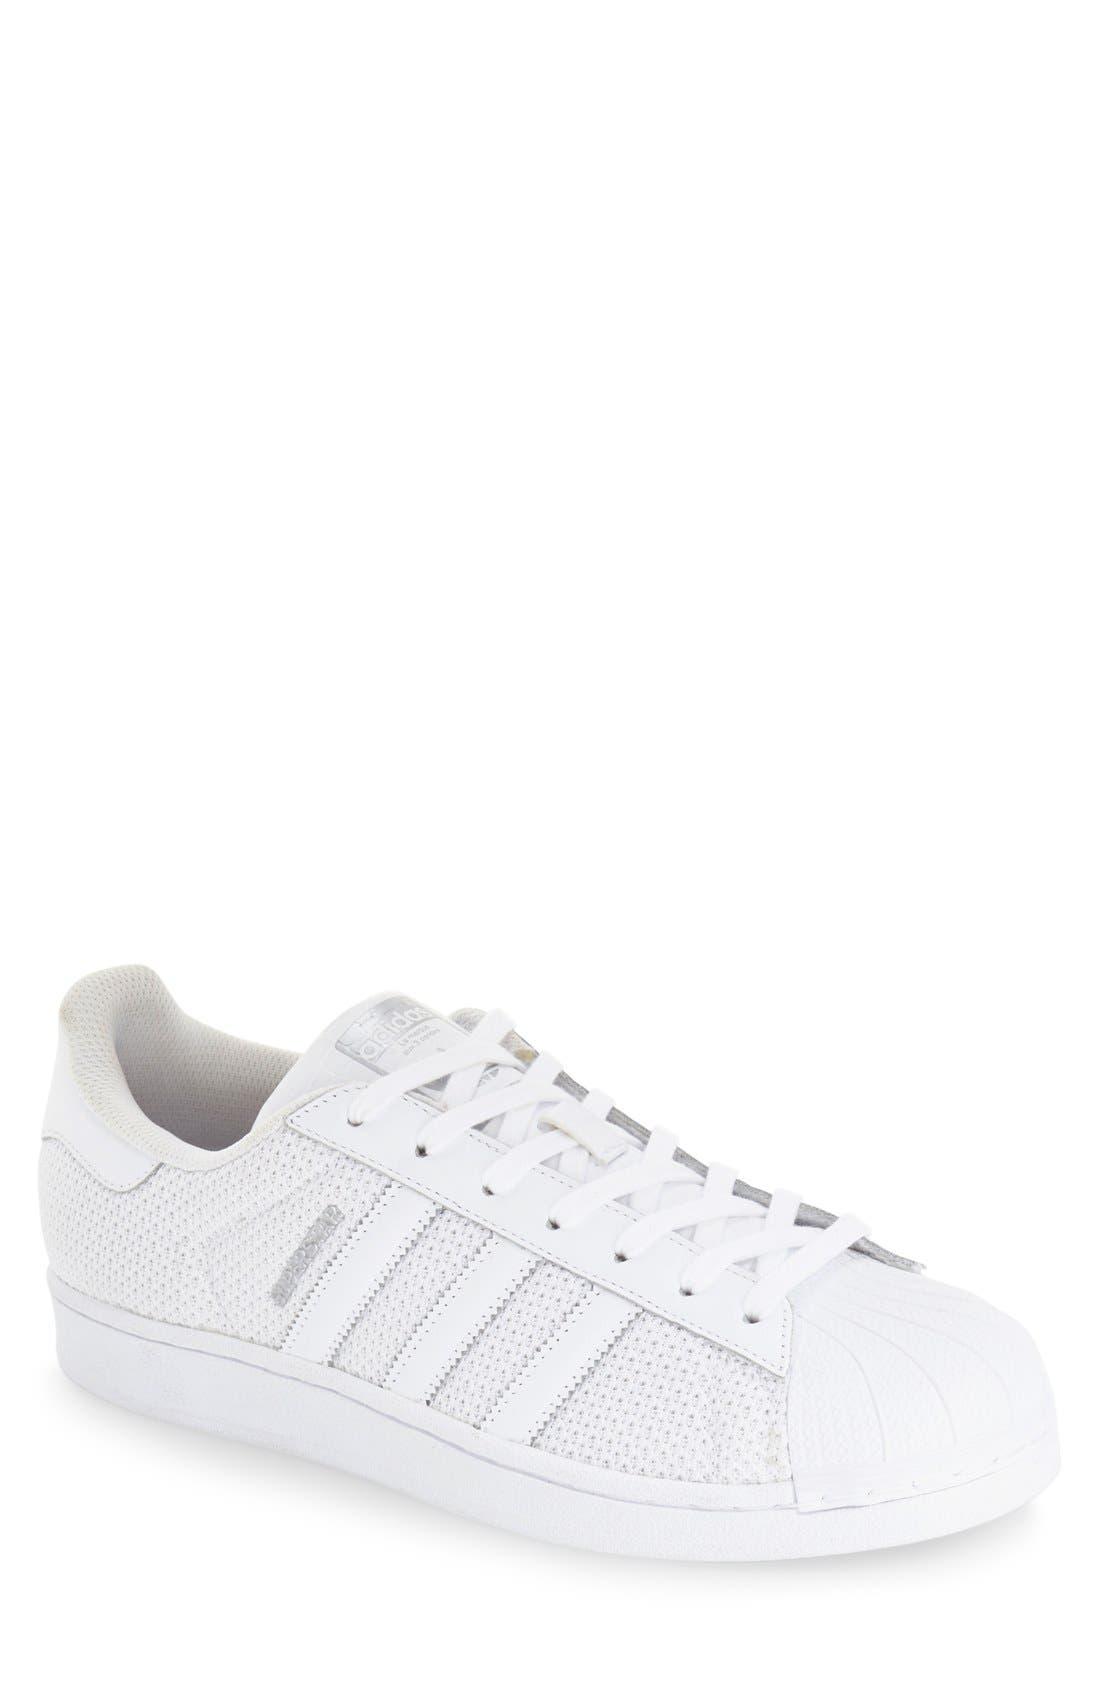 Main Image - adidas 'Superstar' Mesh Sneaker (Women)